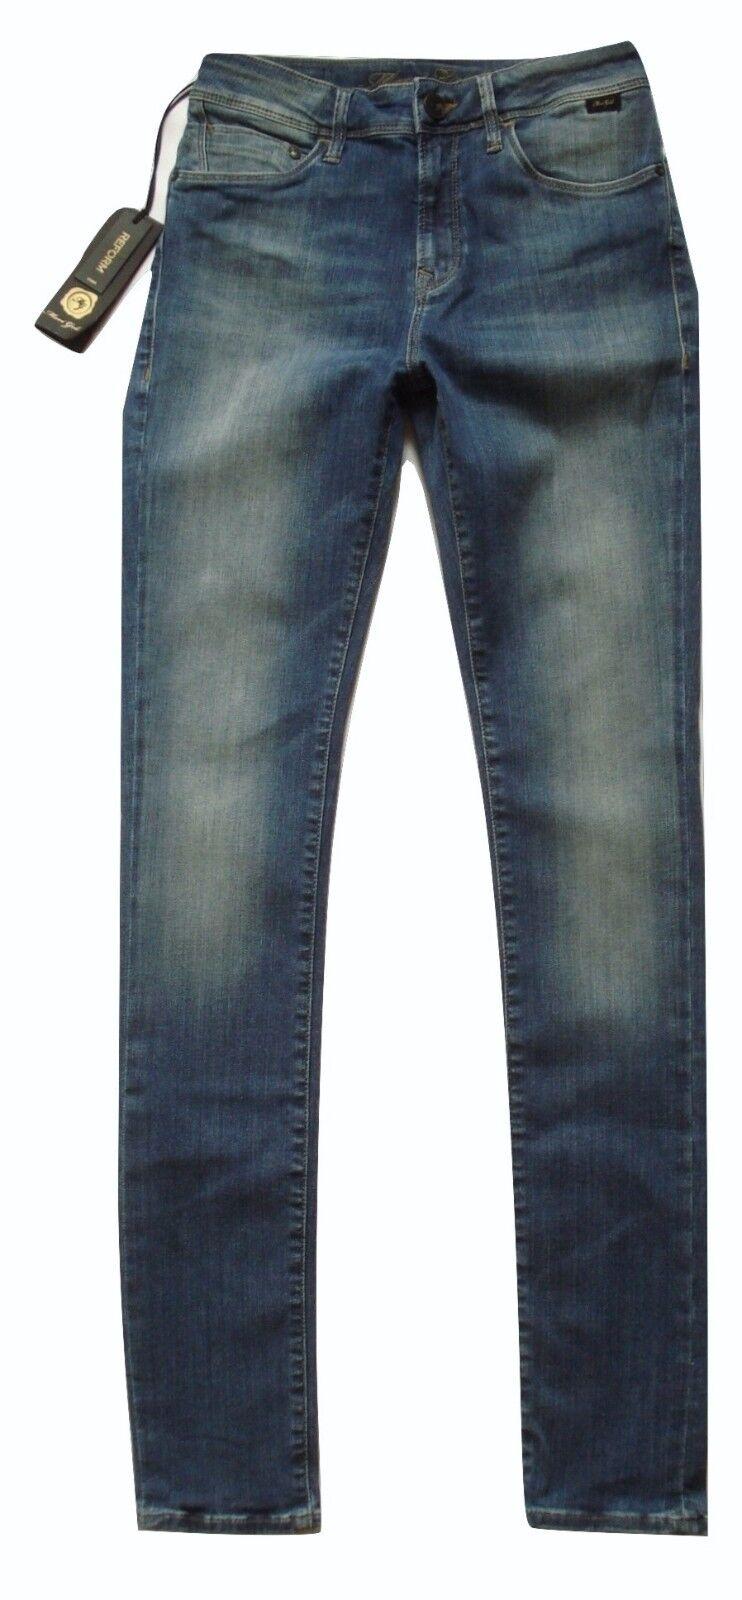 New MAVI Alissa High-Rise Super Skinny Jeans sz 27 32 Wash in Mid gold Reform